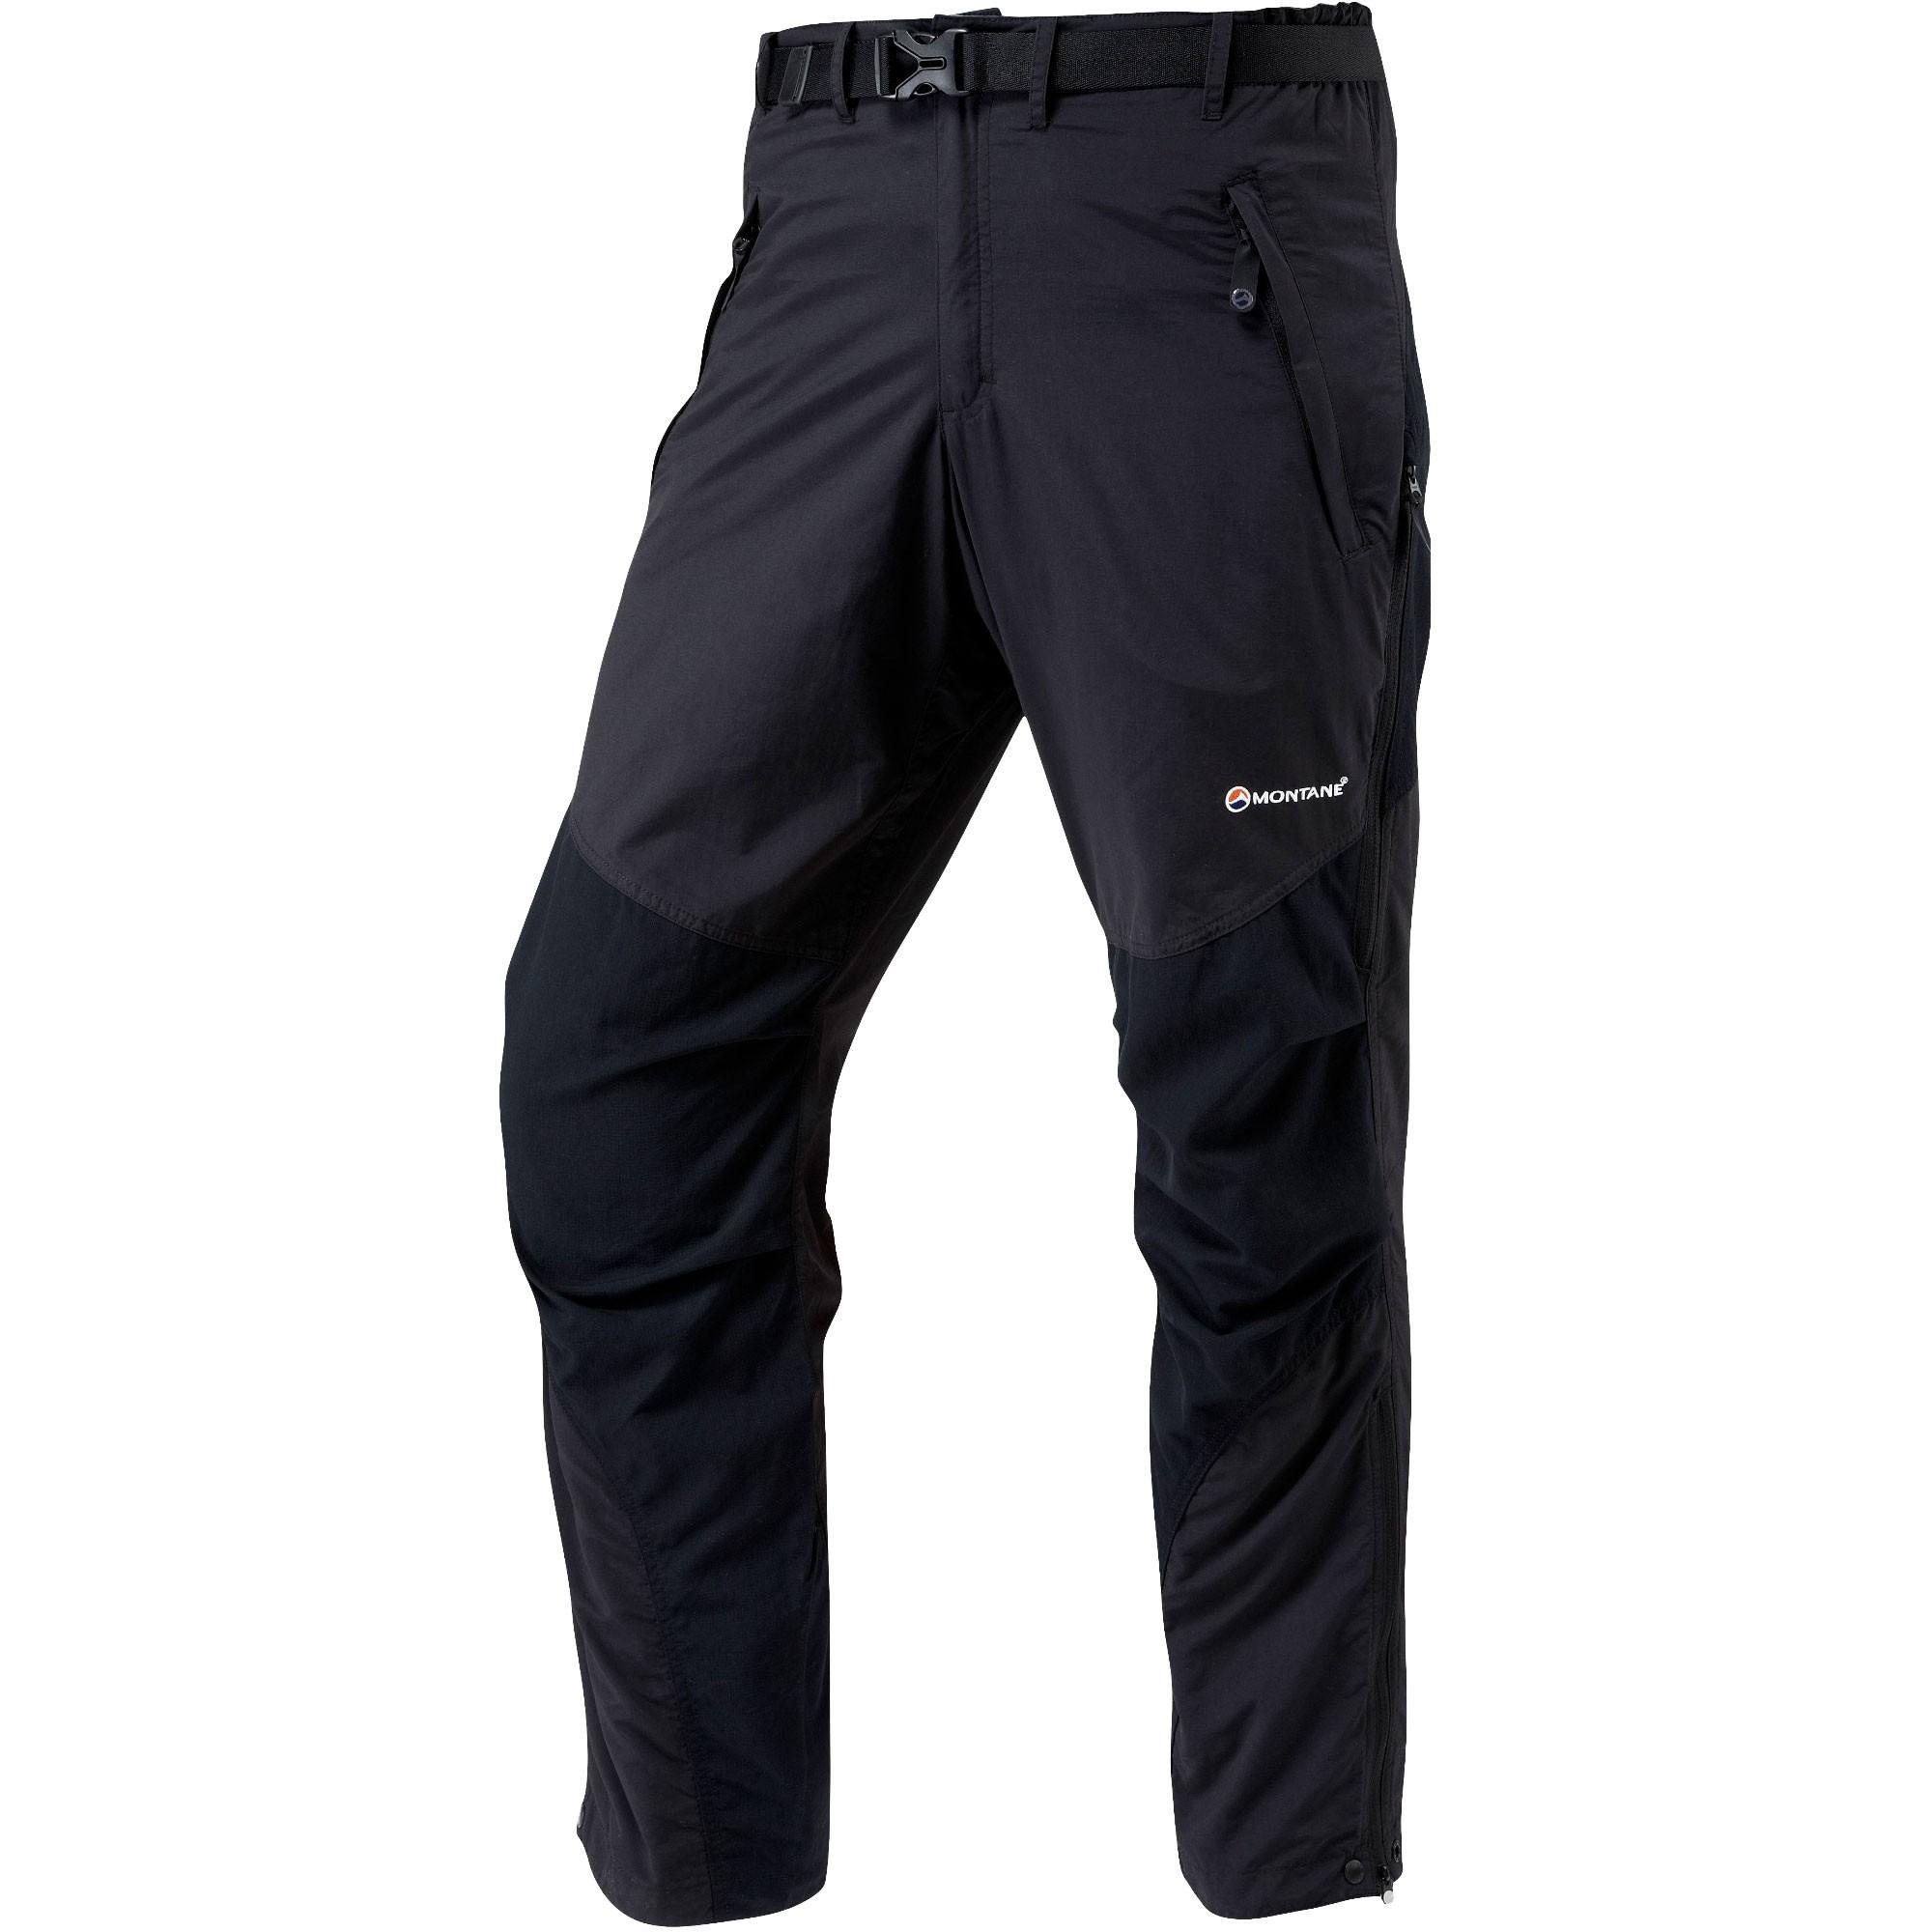 Montane Terra Men's Pants - Black